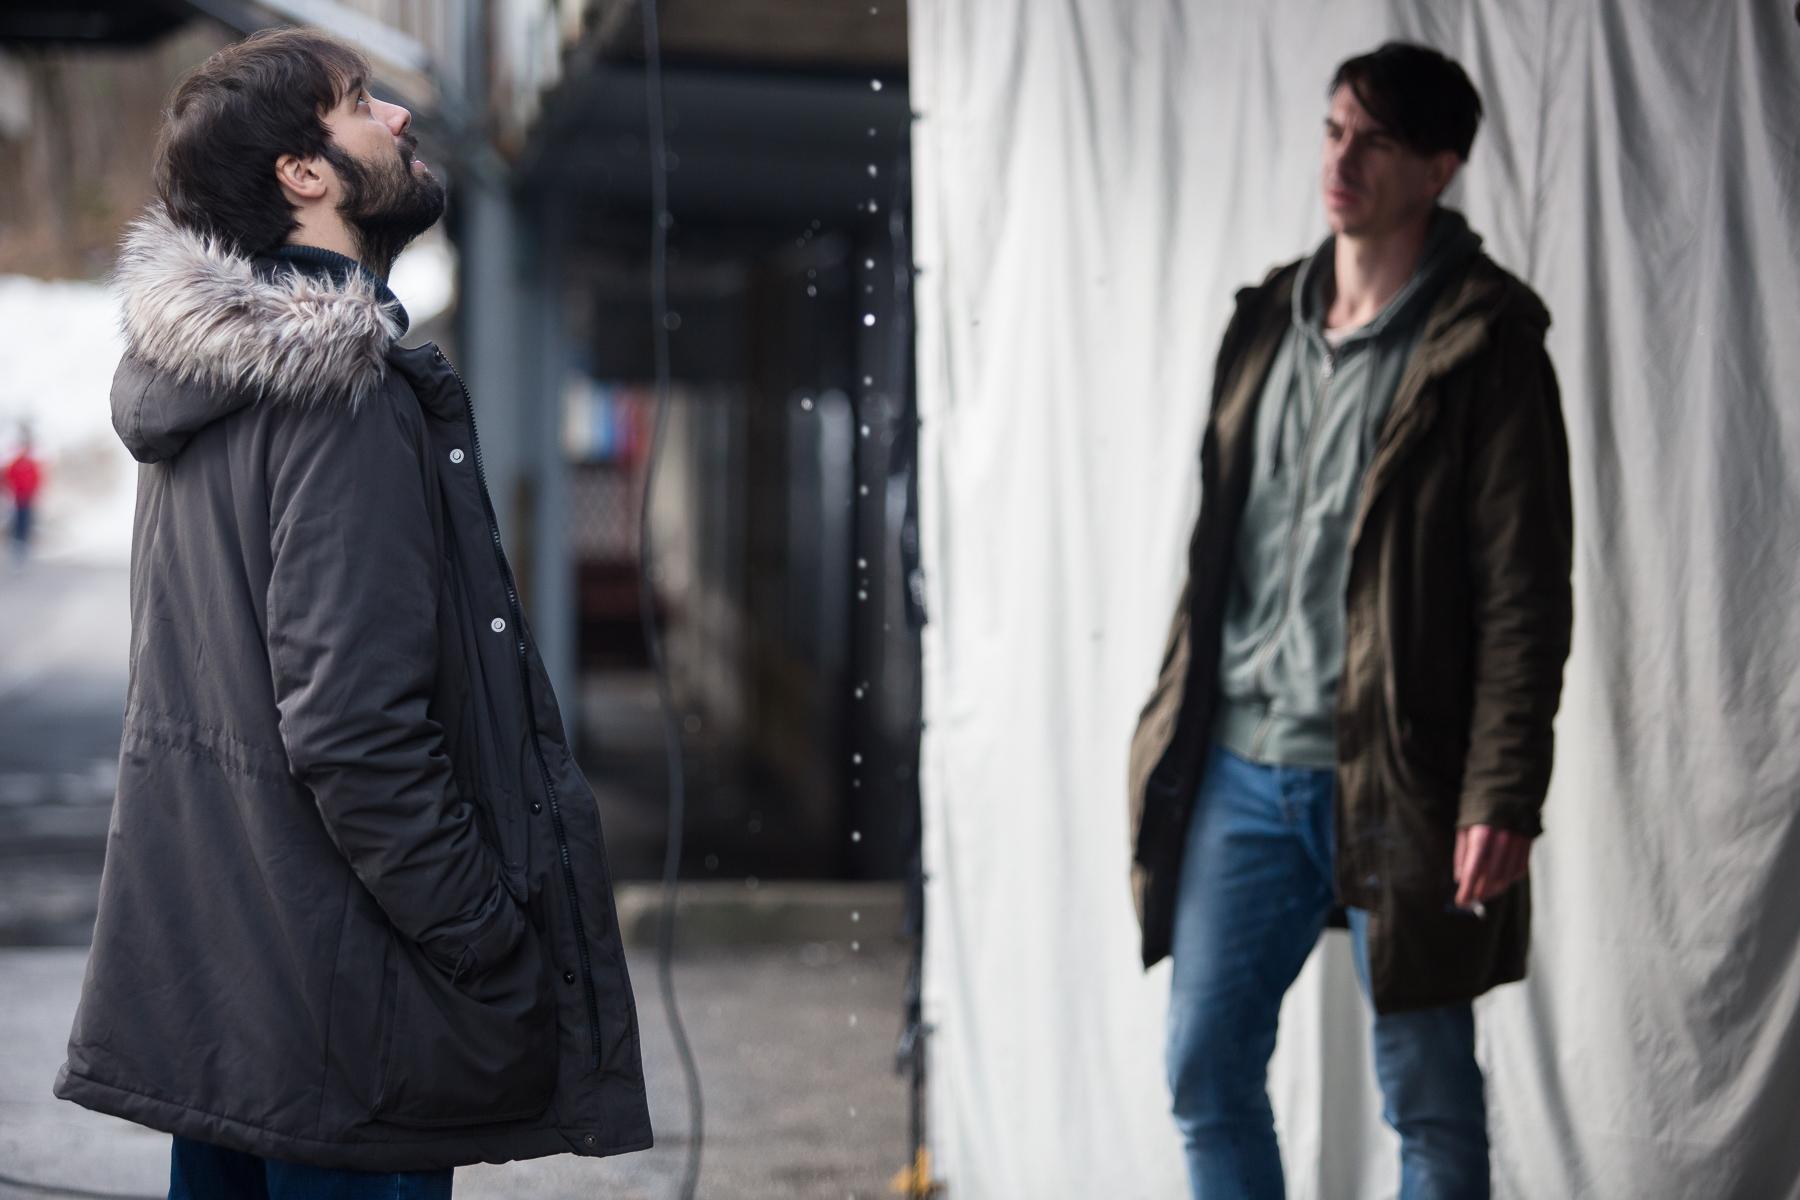 Actors Benjamin Krnetić and Jure Henigman on the set of Wake Me.